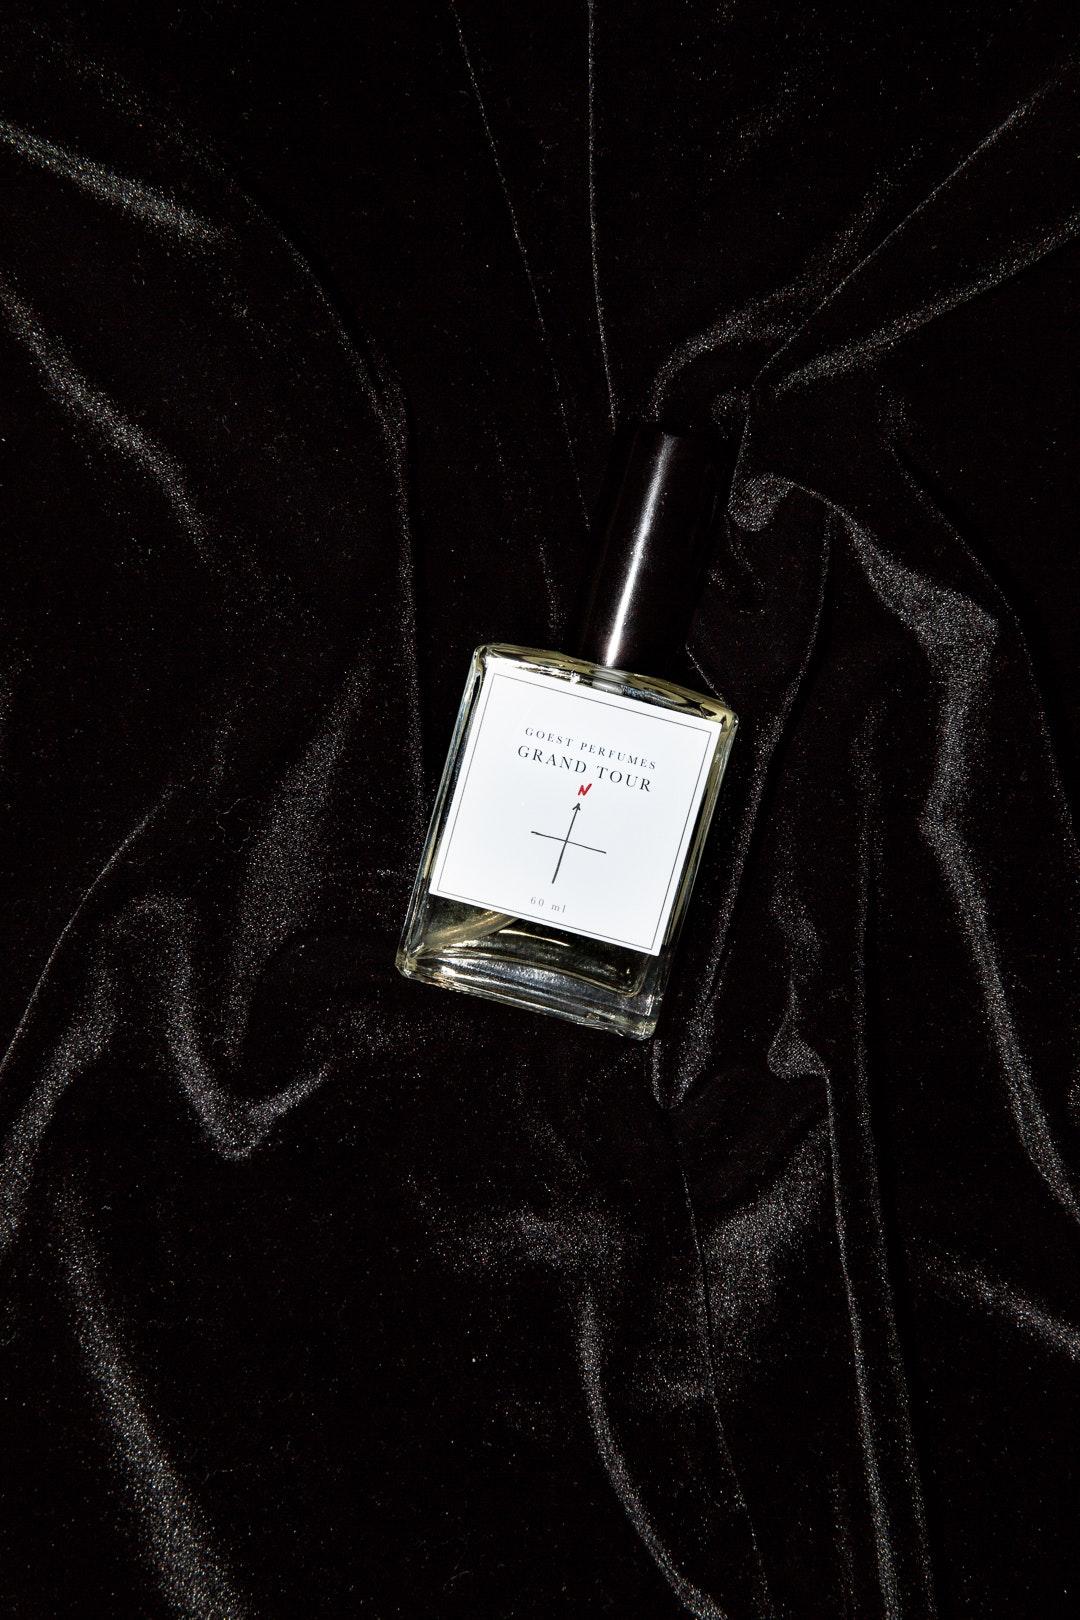 Goest Perfumes 0528